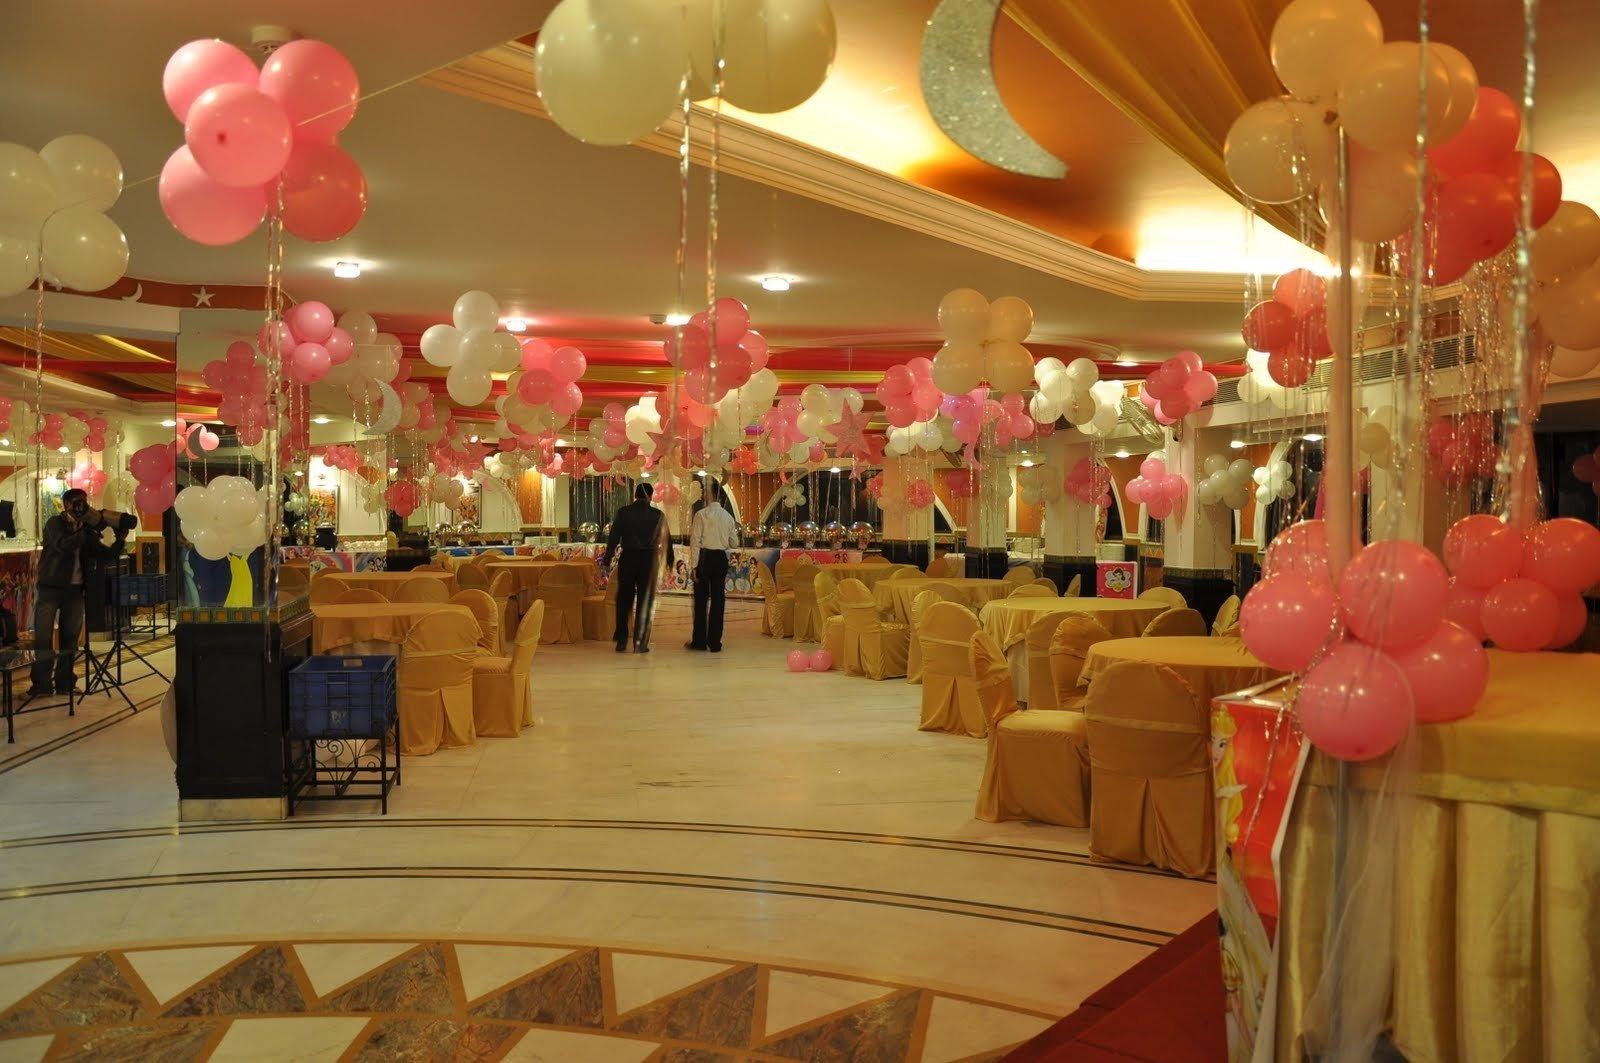 10 Attractive Party Decoration Ideas For Adults birthday party decorating ideas adults decorations tierra este 1 2020